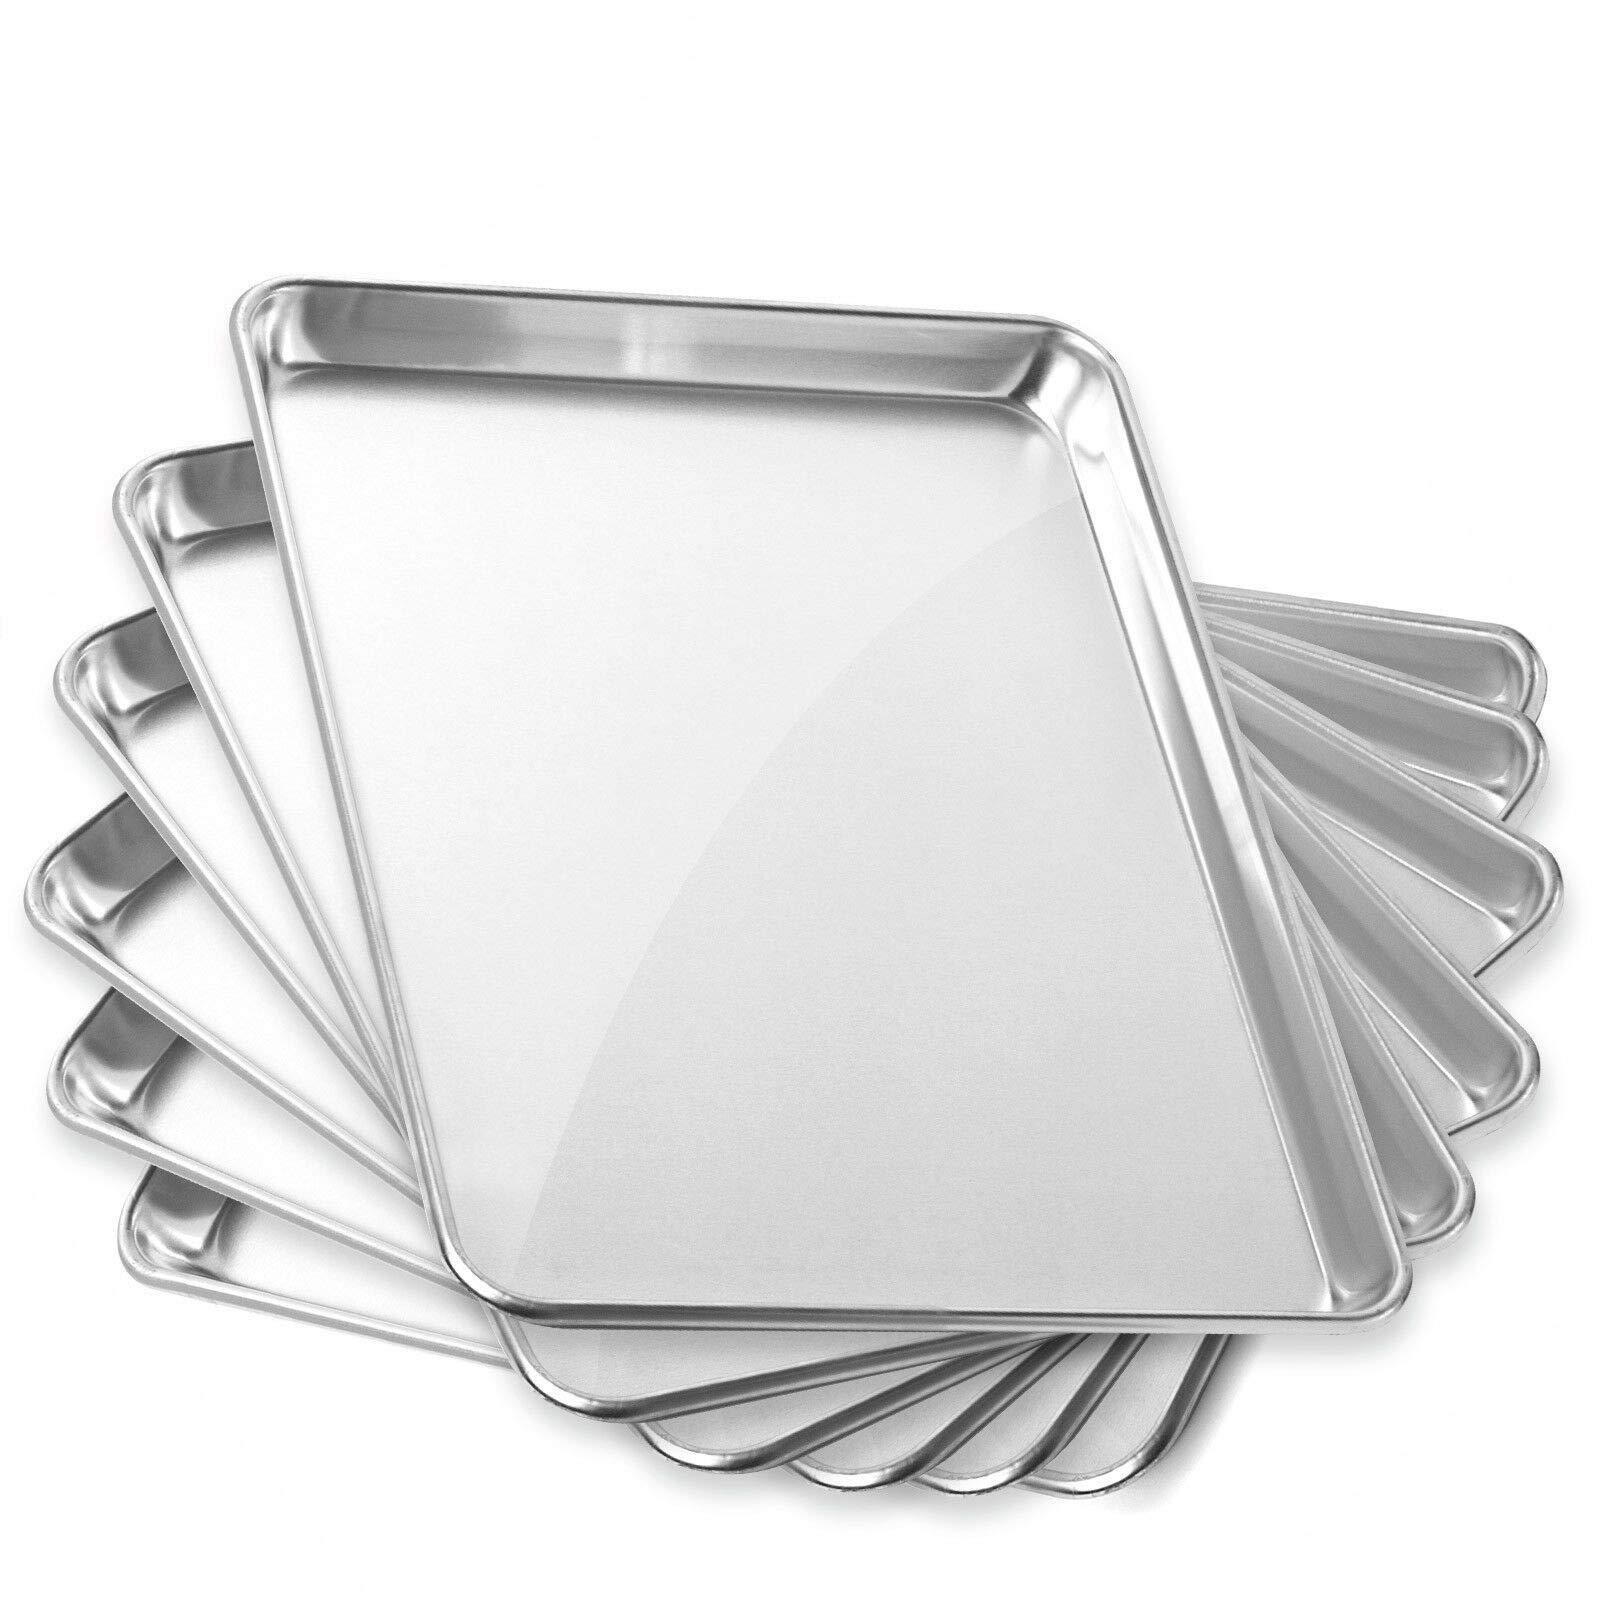 6 Pans Aluminum Baking Pans 13 x 18 Inch #MWMN